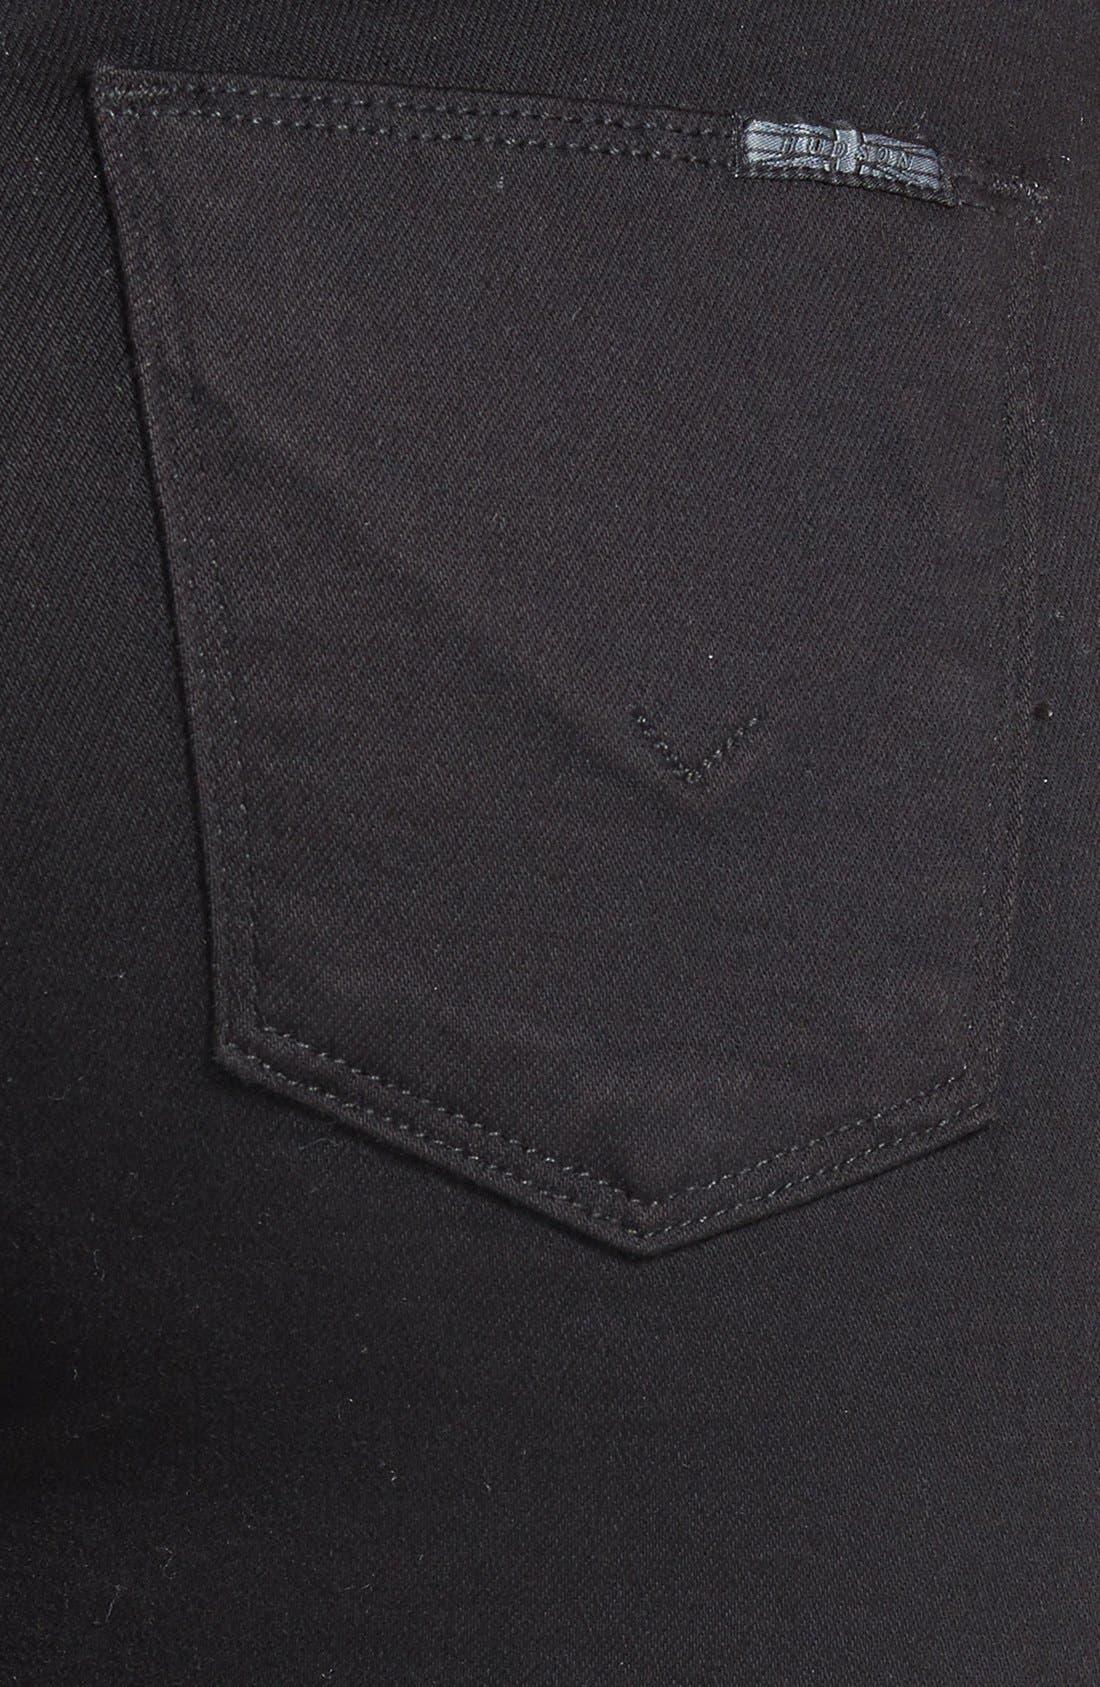 Alternate Image 3  - Hudson Jeans 'Nico' Mid Rise Super Skinny Jeans (Black)